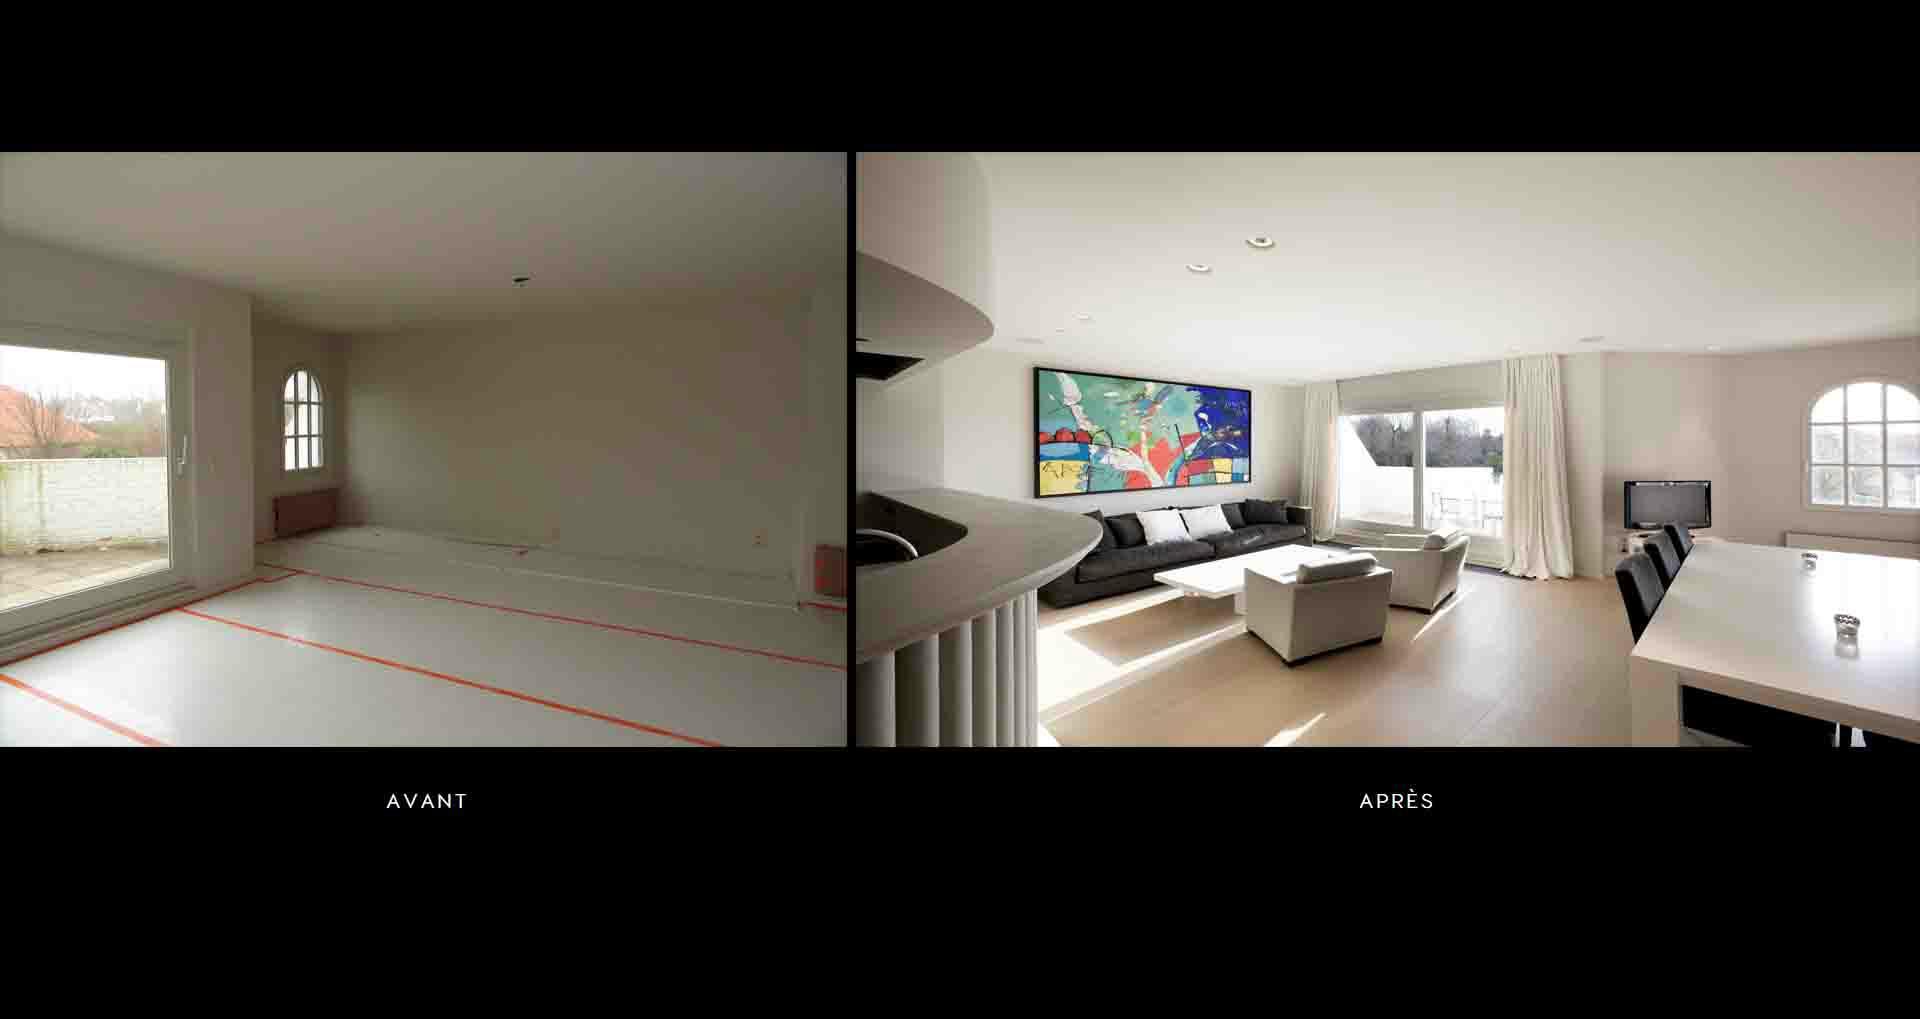 renovation appartement avant apres gallery of avant apres les lilas with renovation appartement. Black Bedroom Furniture Sets. Home Design Ideas